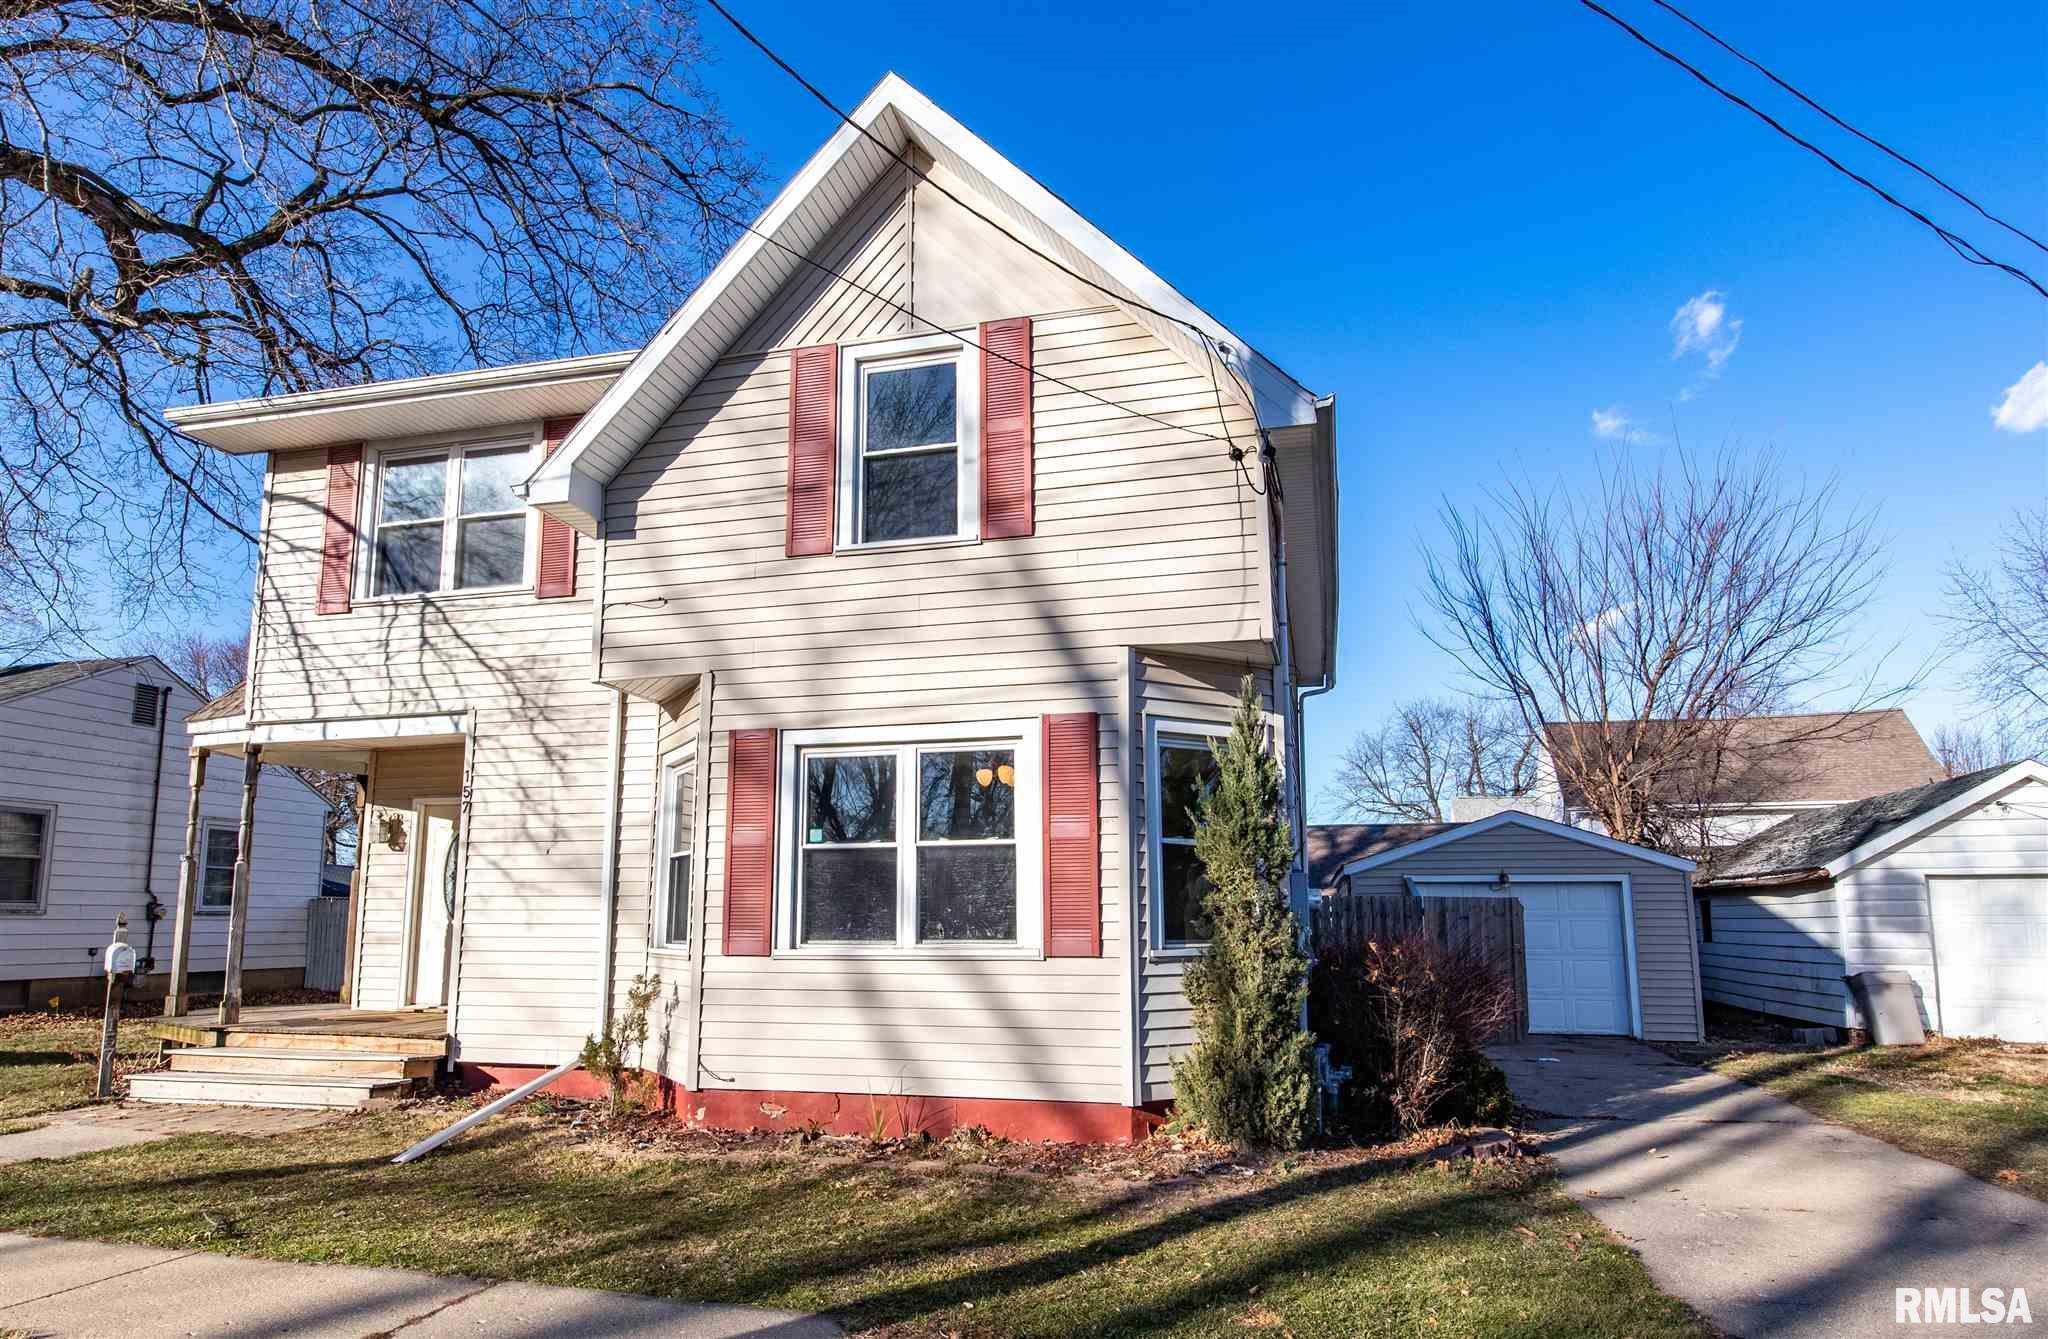 157 E COURT Property Photo - Farmington, IL real estate listing